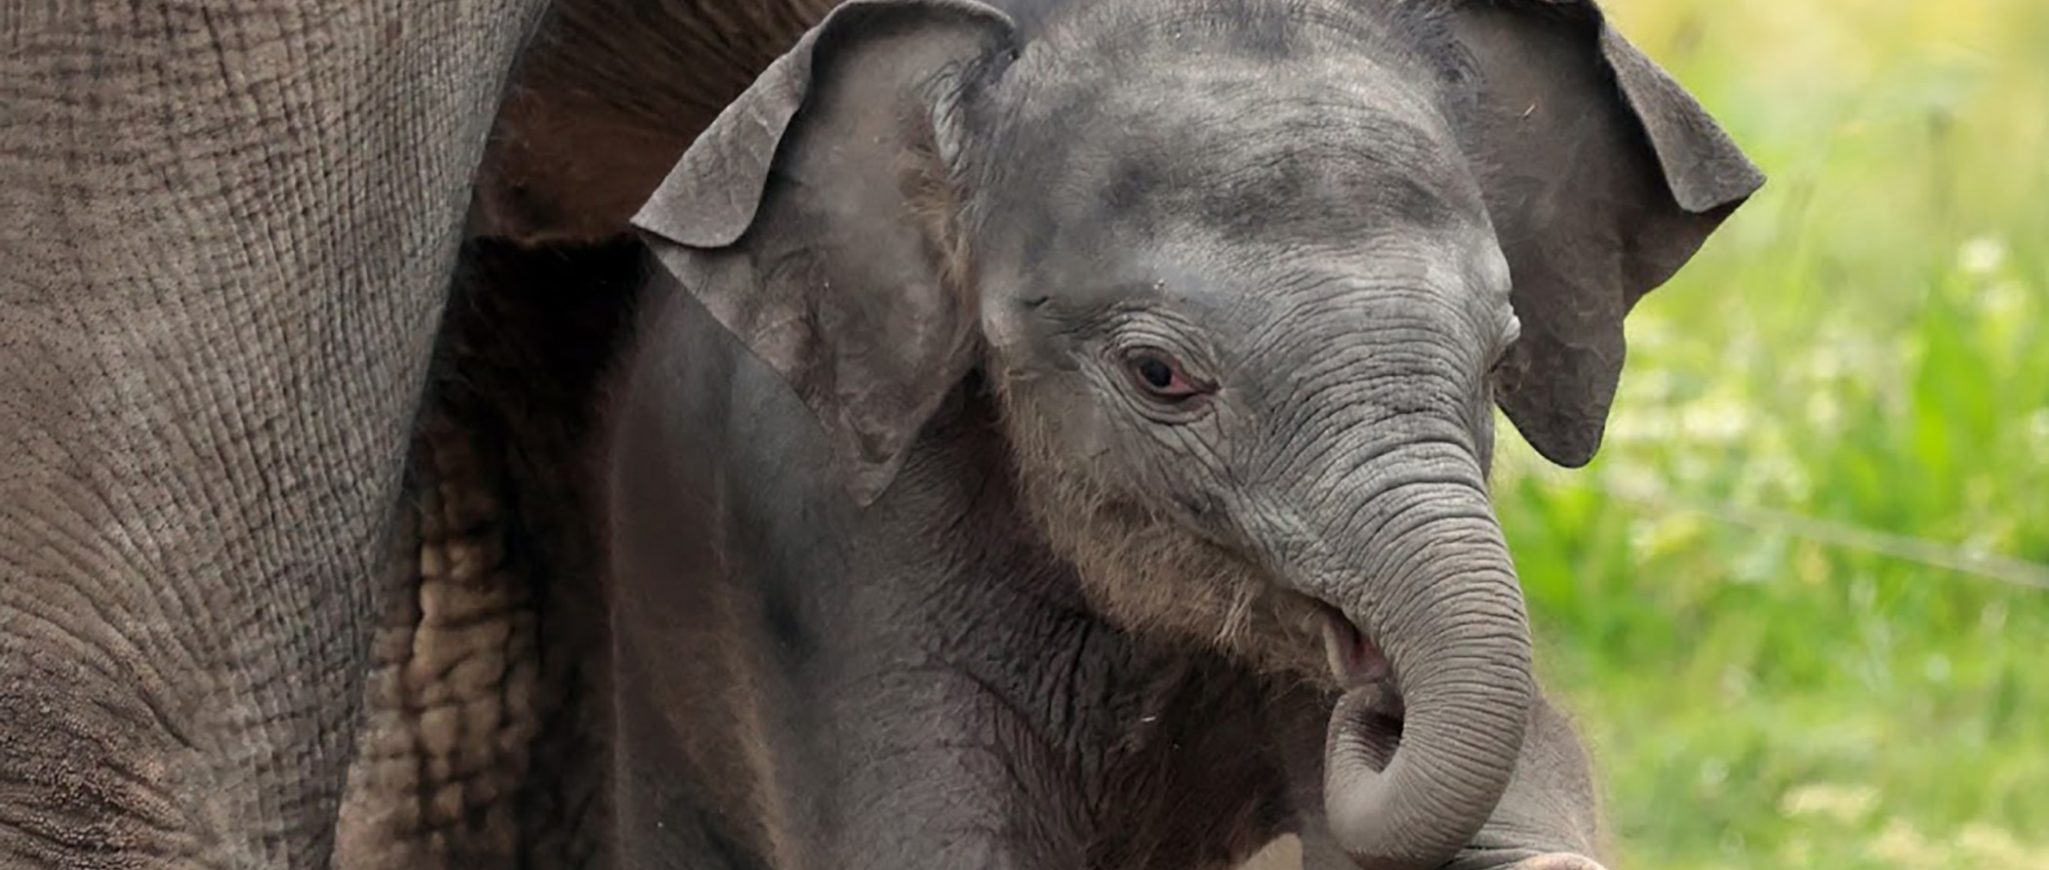 baby elephant born in May 2021